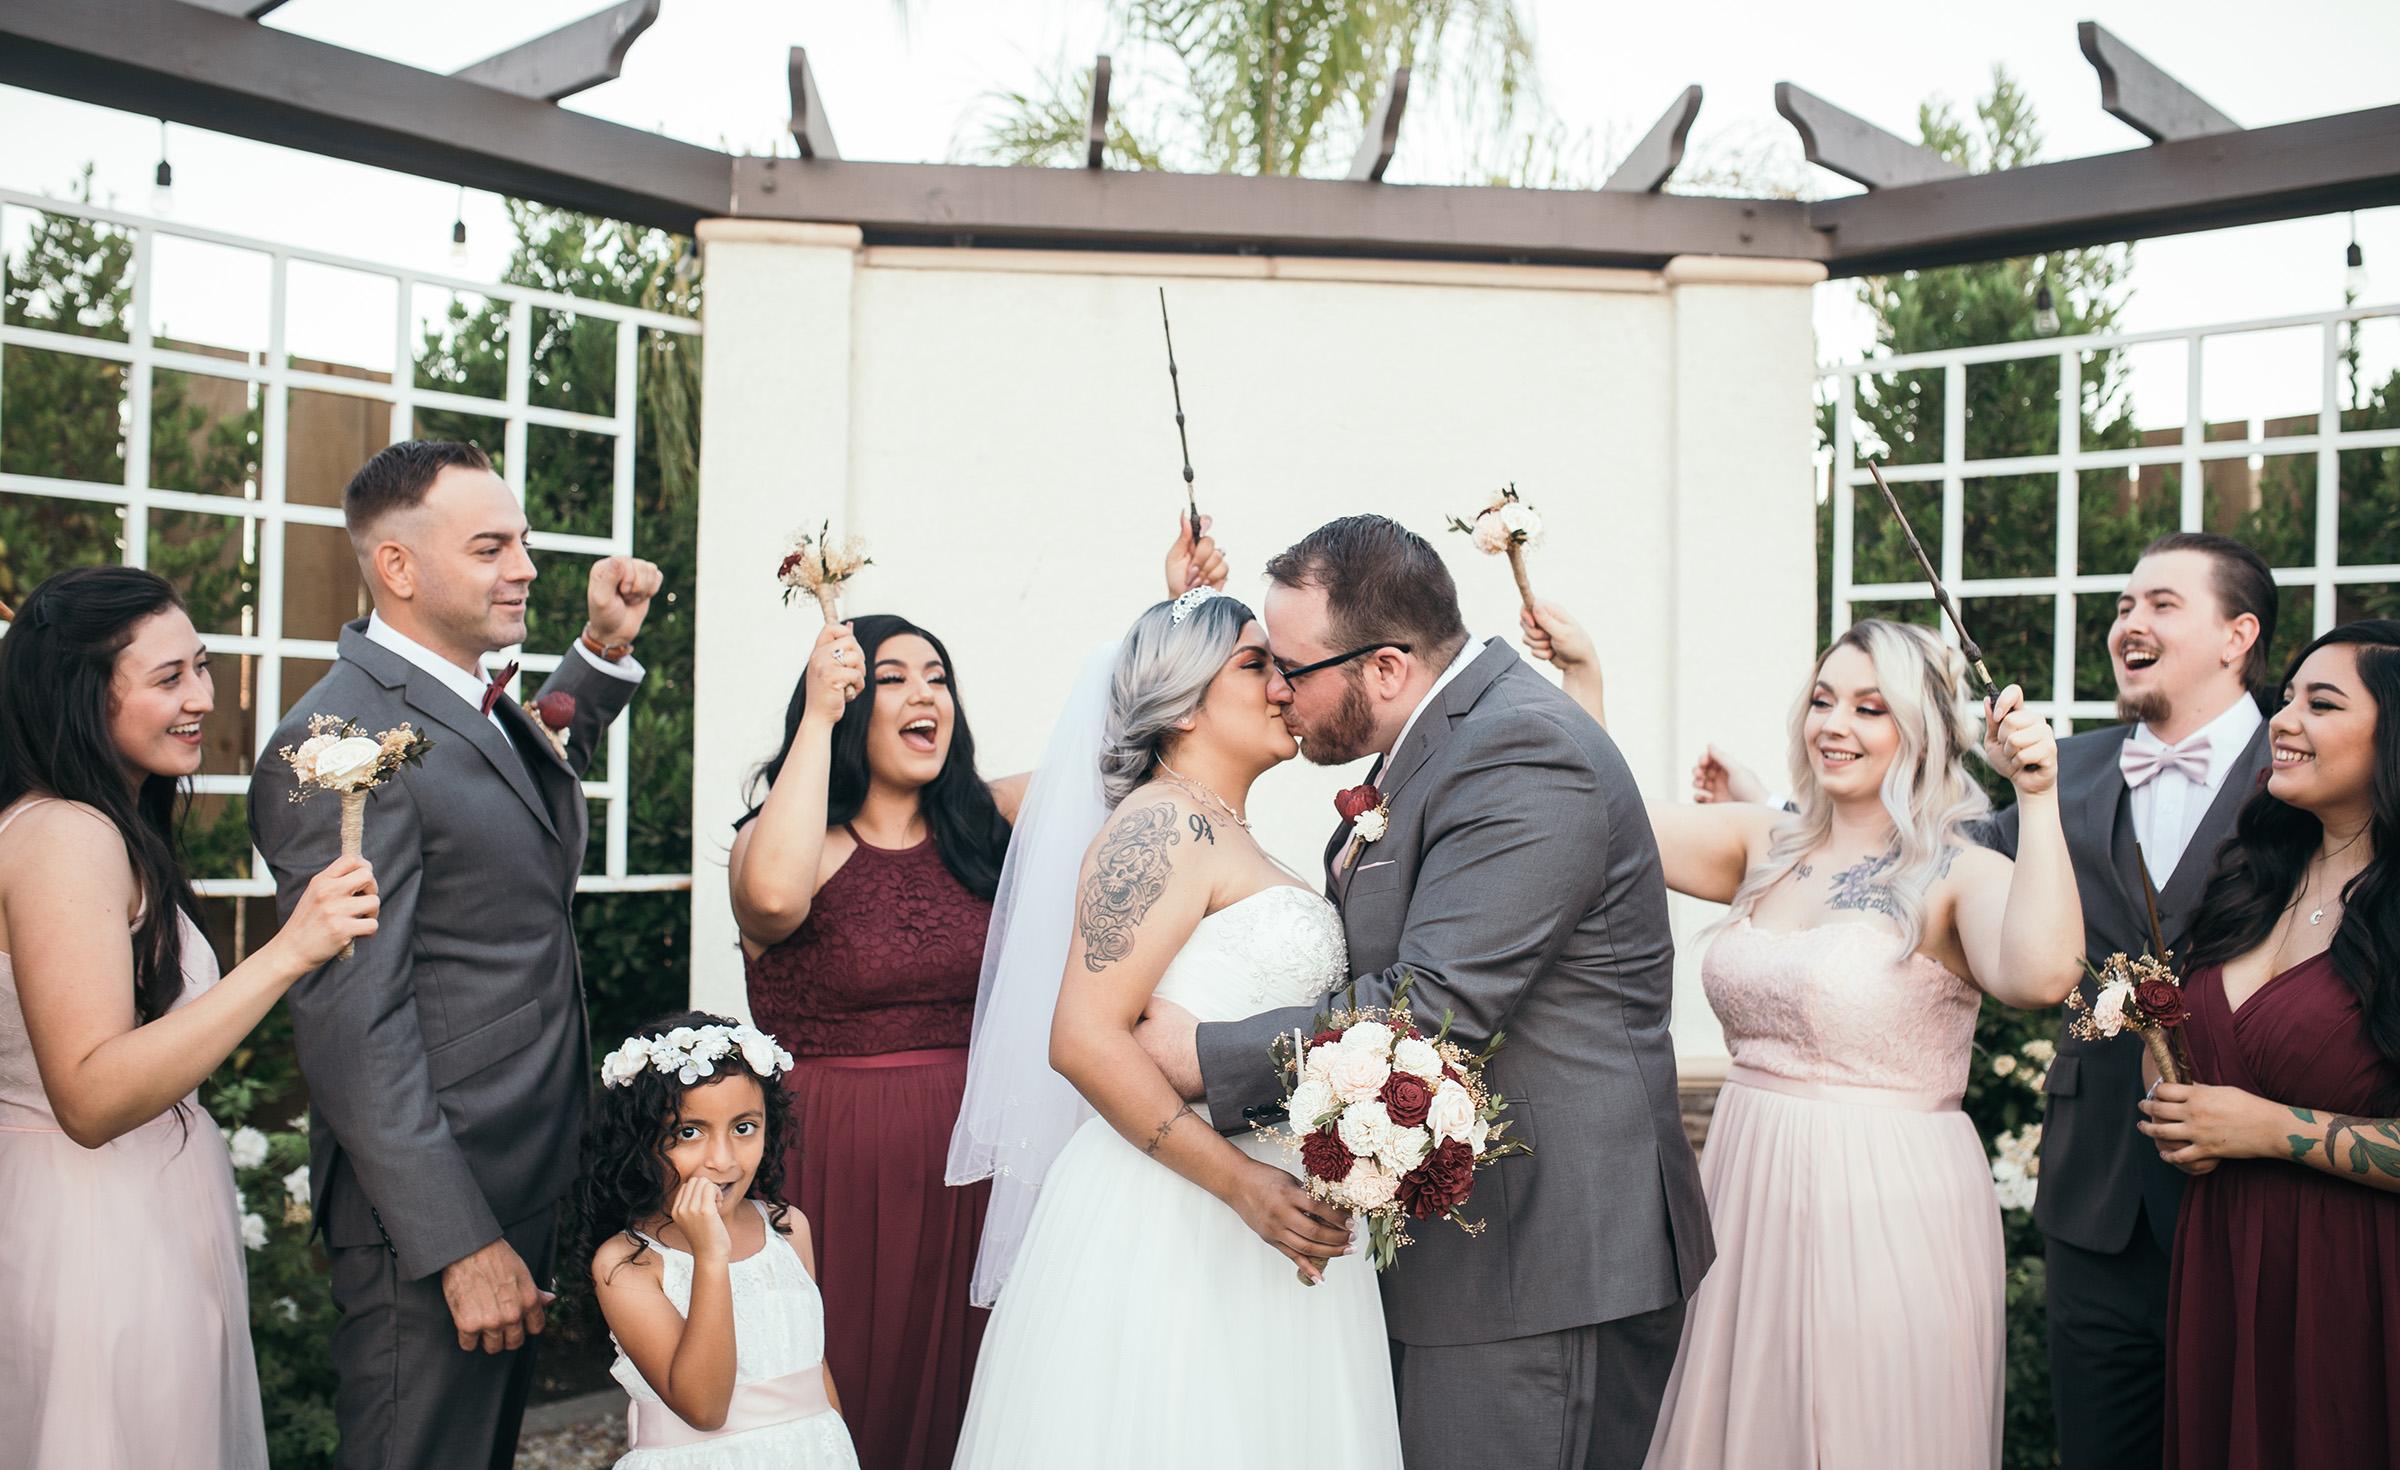 Magical theme wedding - Fresno - Fresno, California - Frenso County - Wedgewood Weddngs